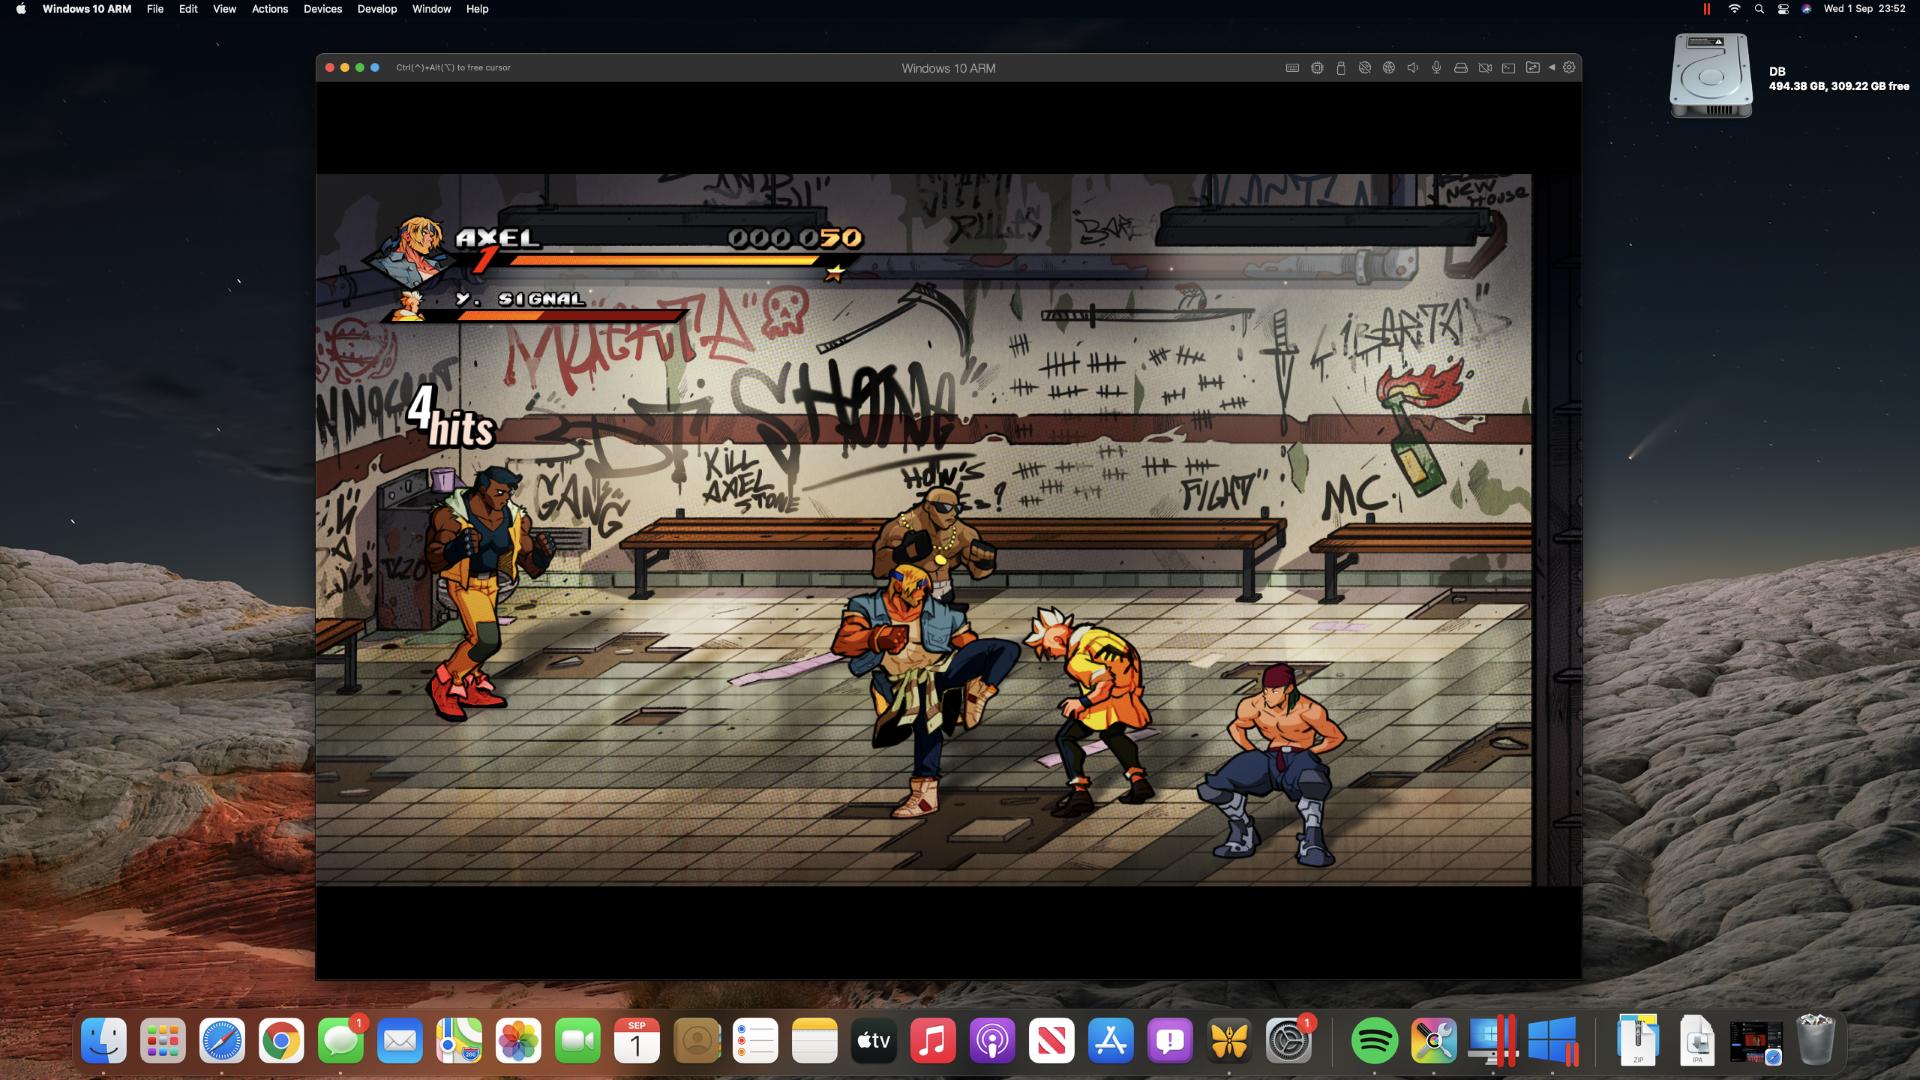 Streets of Rage 4 on an M1 Mac mini through Steam